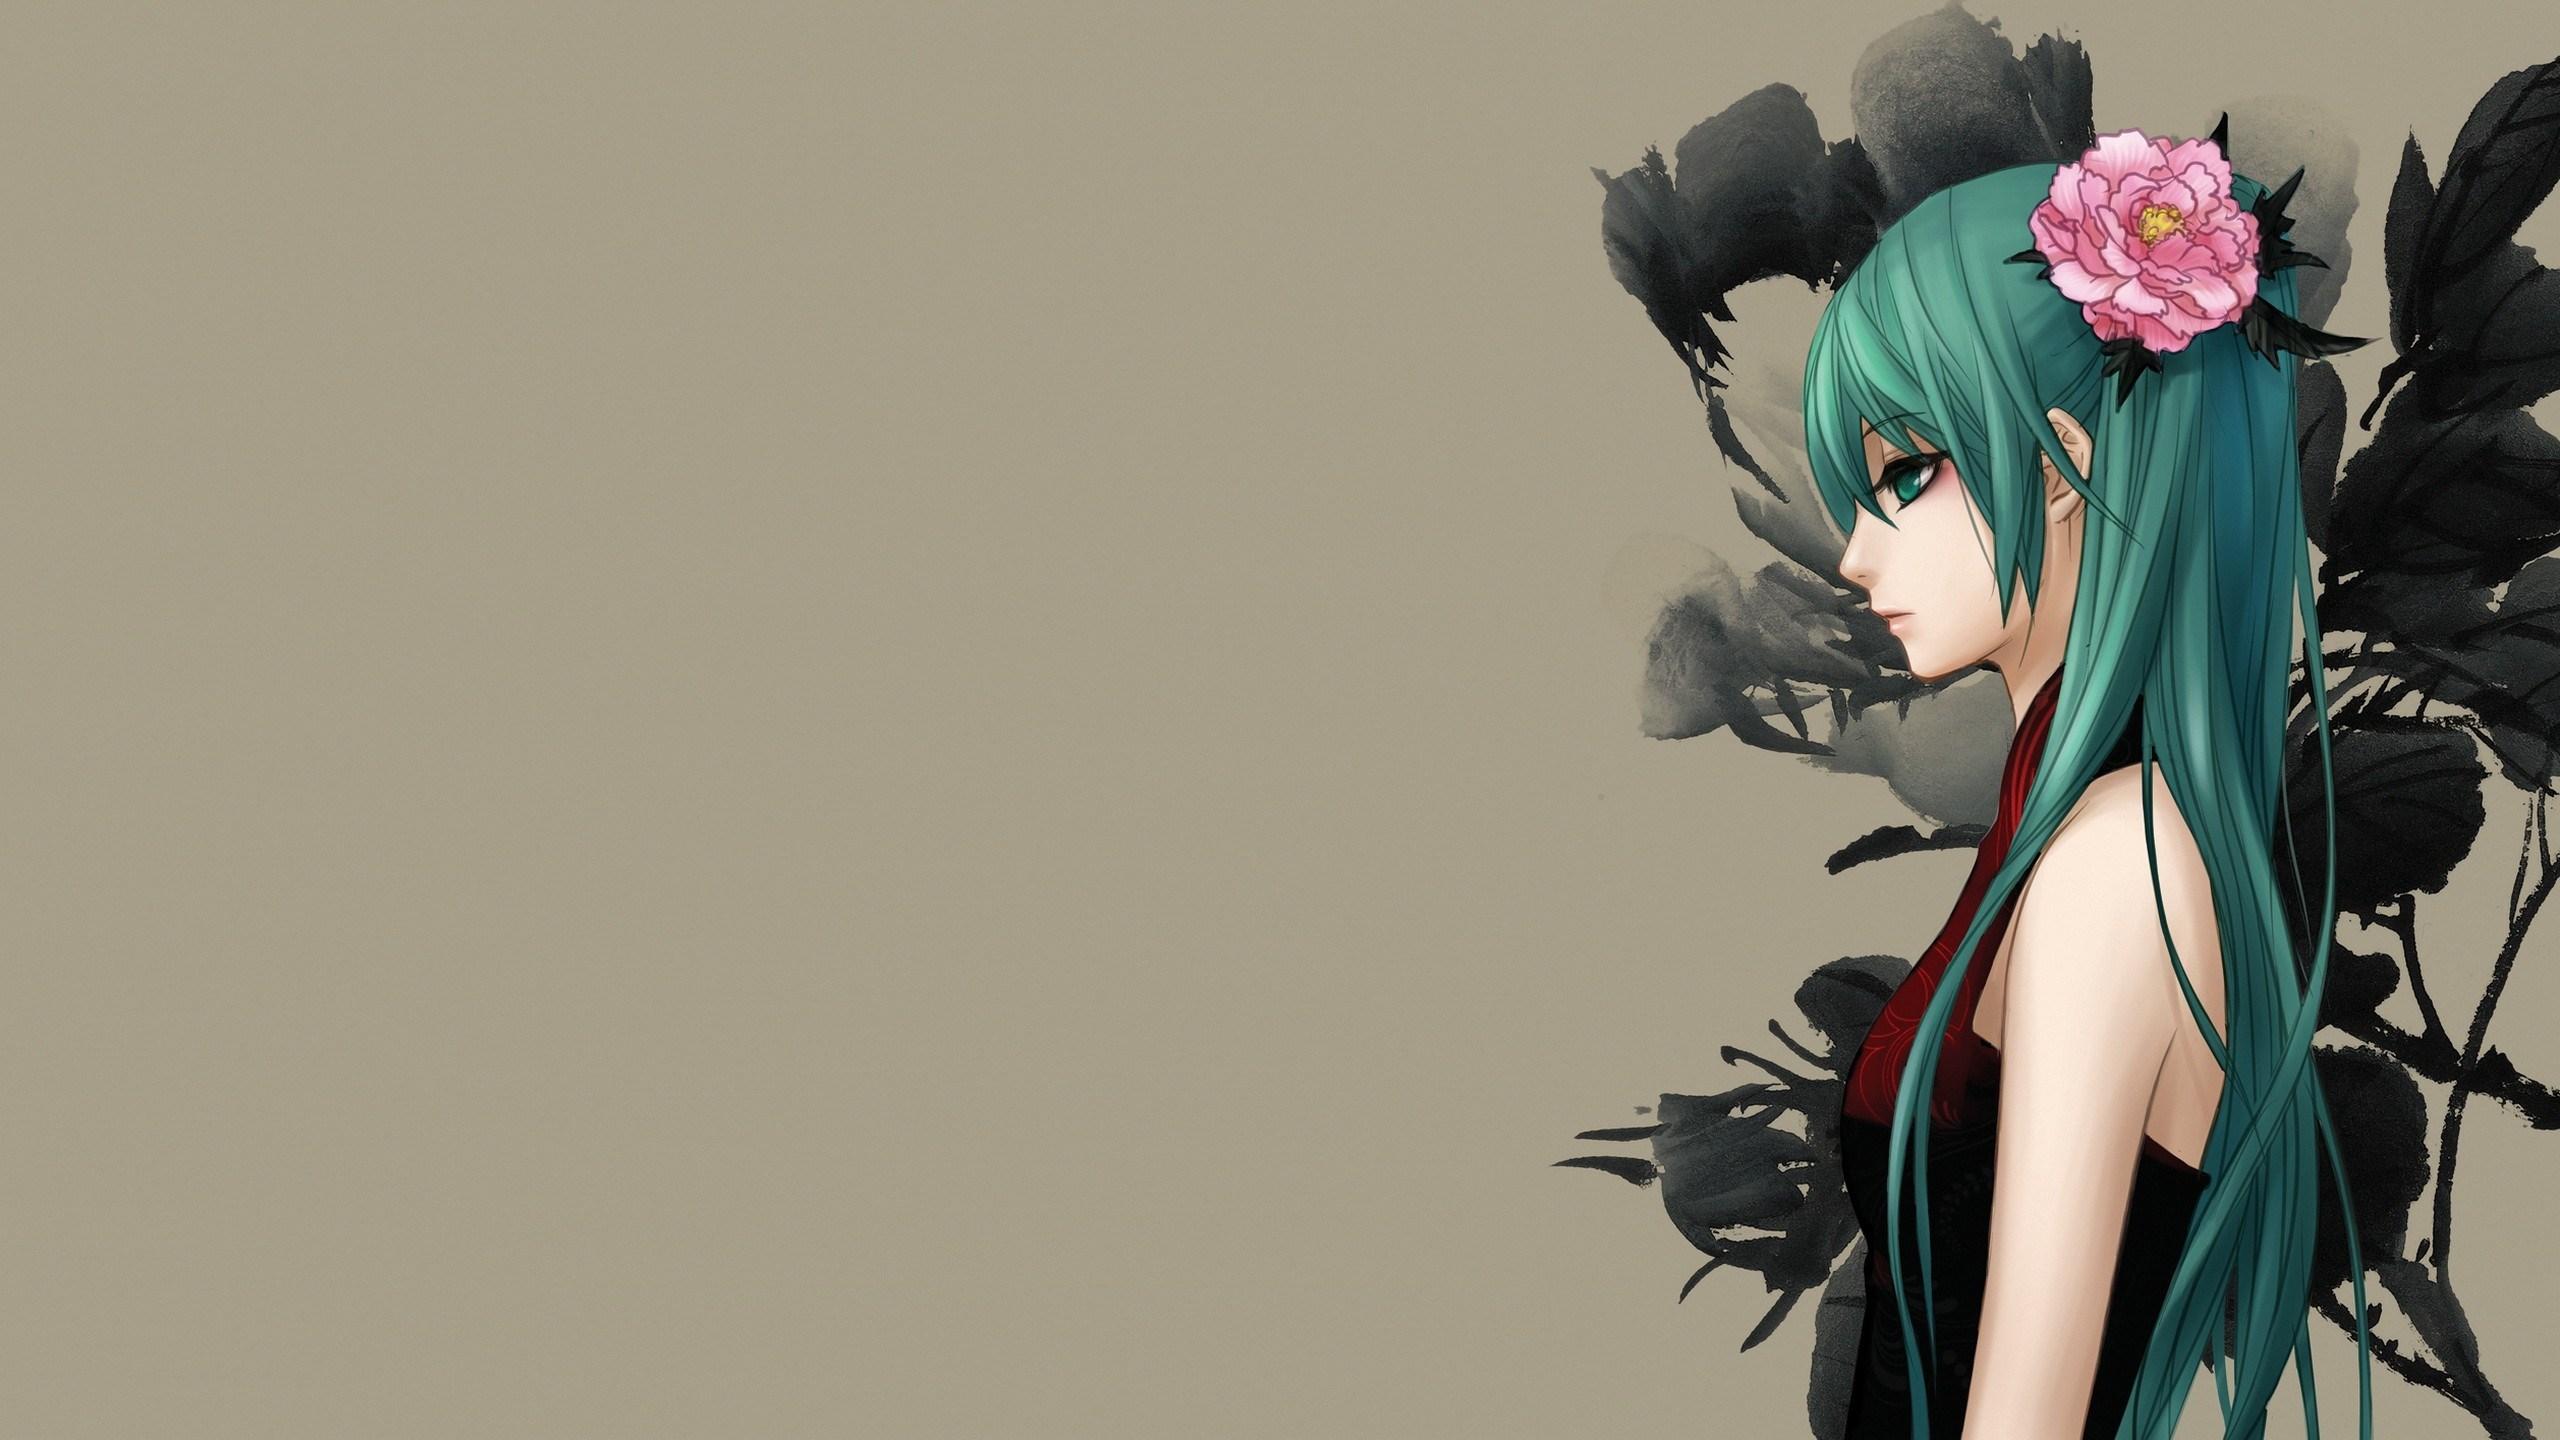 Hatsune Miku Art Anime Girl